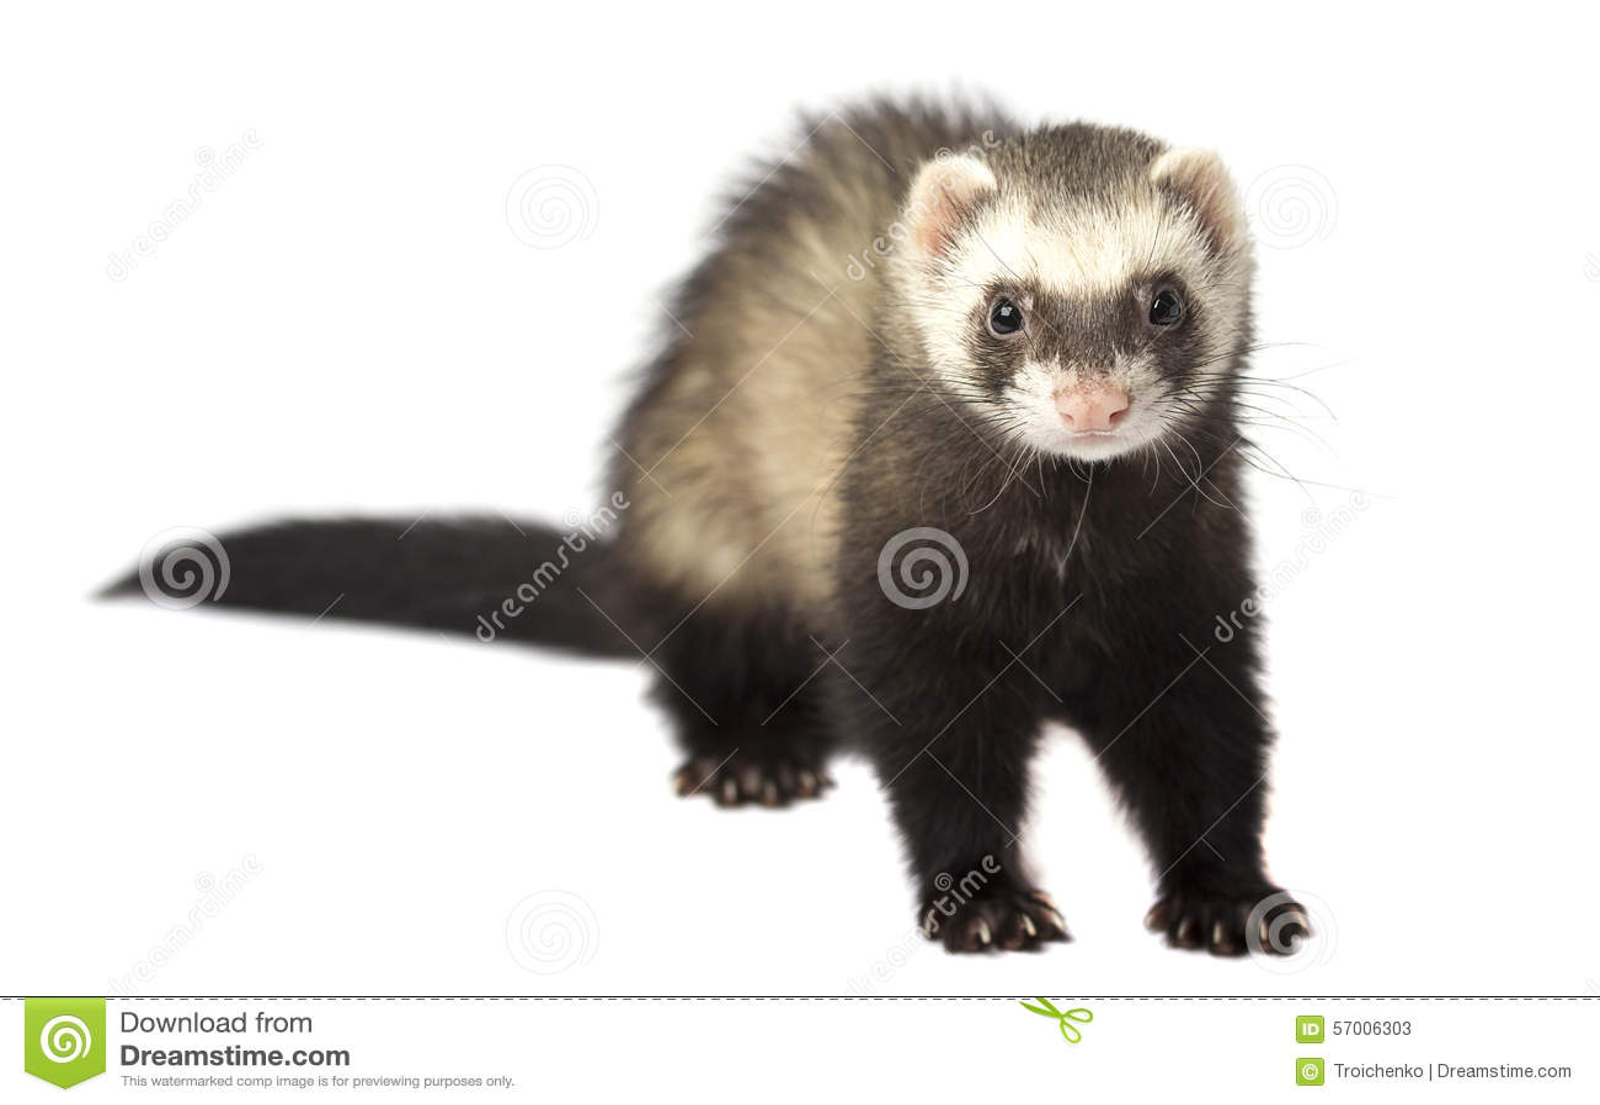 The evil ferret isolated stock image. Image of evil ... | 1300 x 914 jpeg 71kB